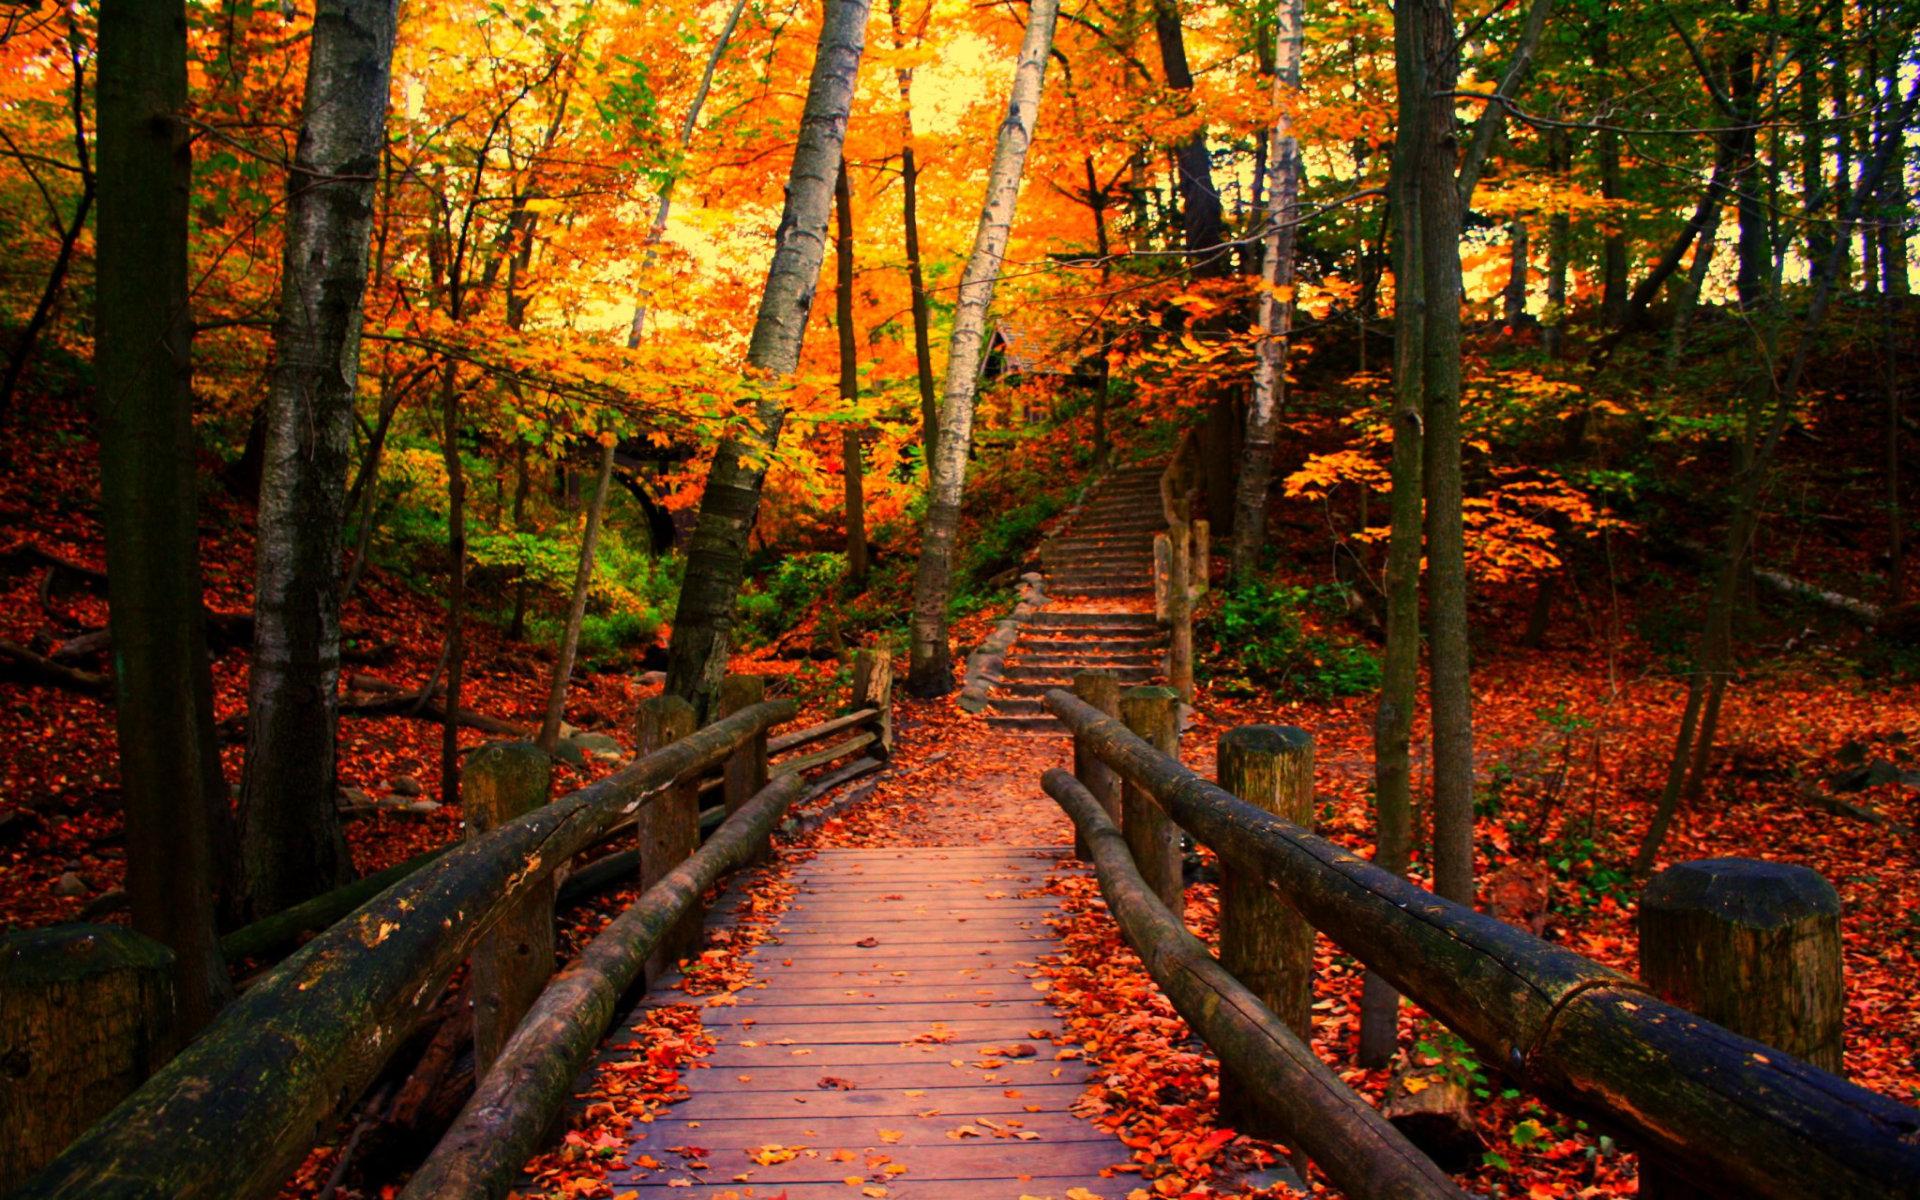 Autumn In Wisconsin wallpaper   ForWallpapercom 1920x1200